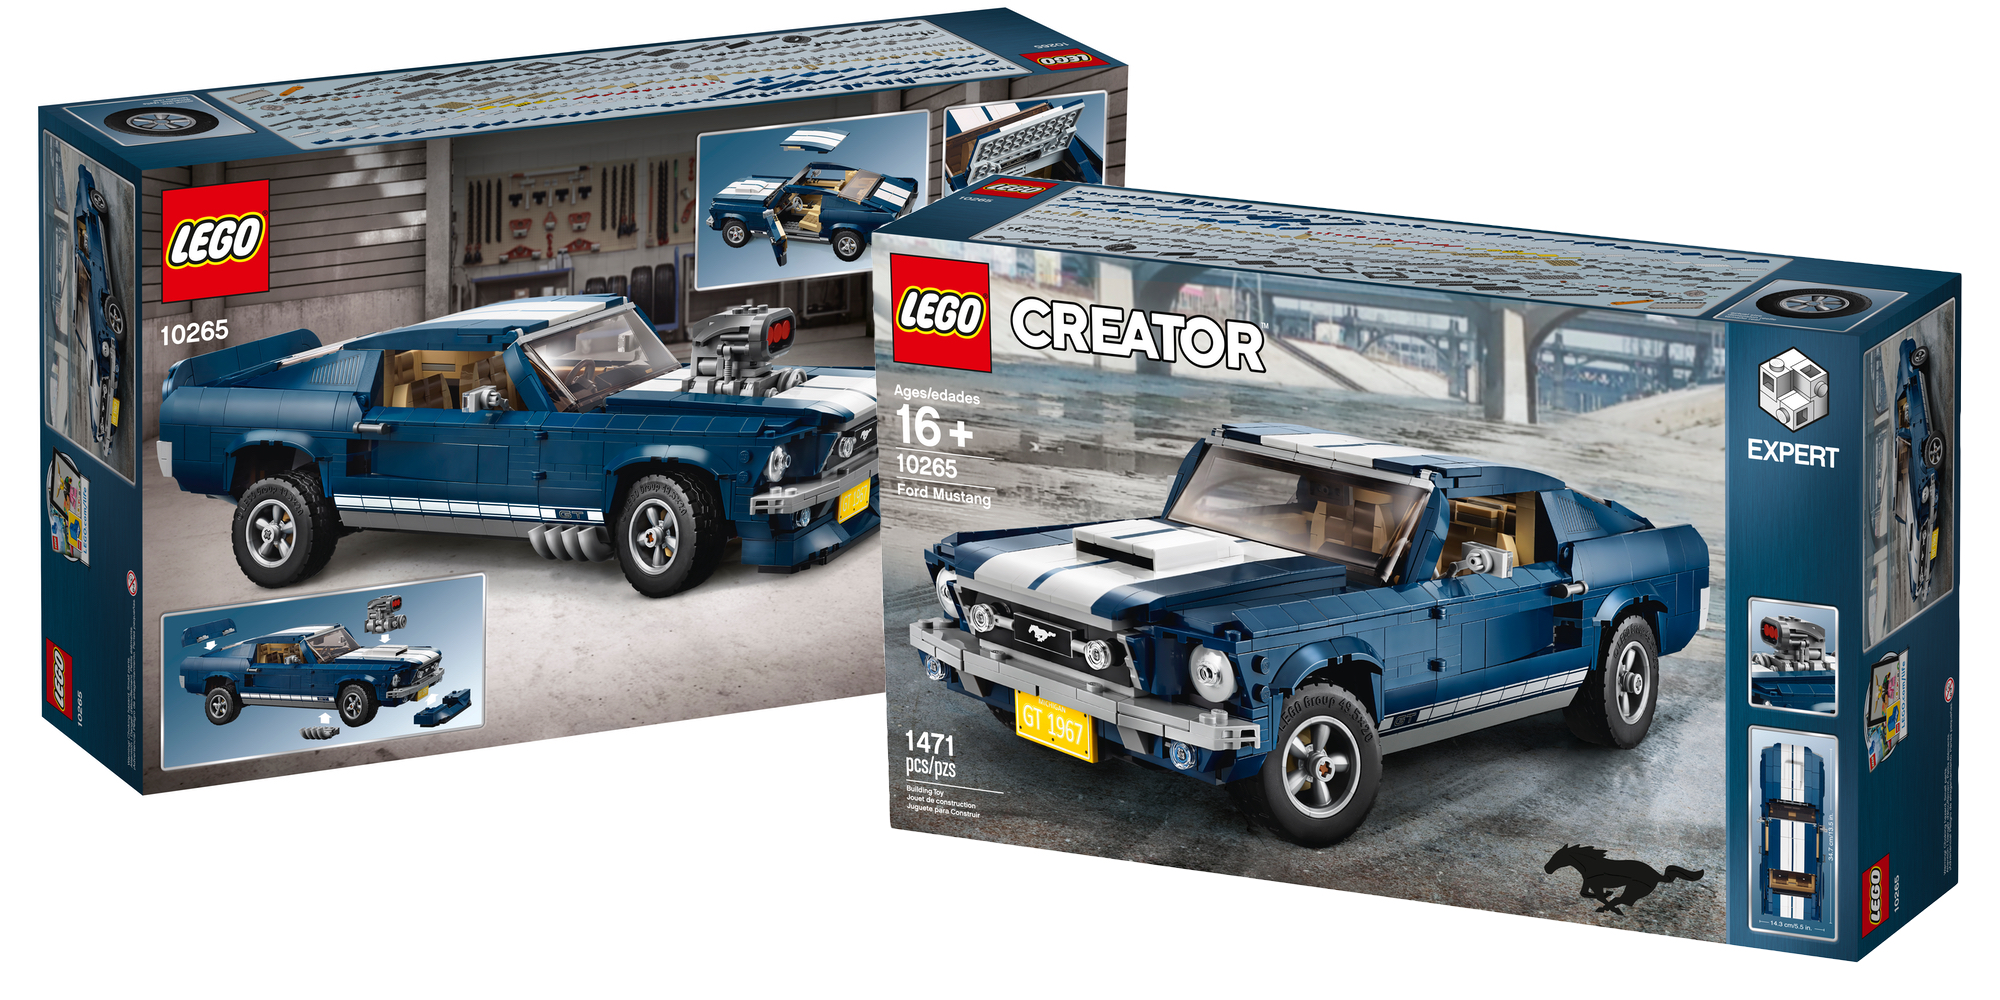 LEGO Ford Mustang Box Art